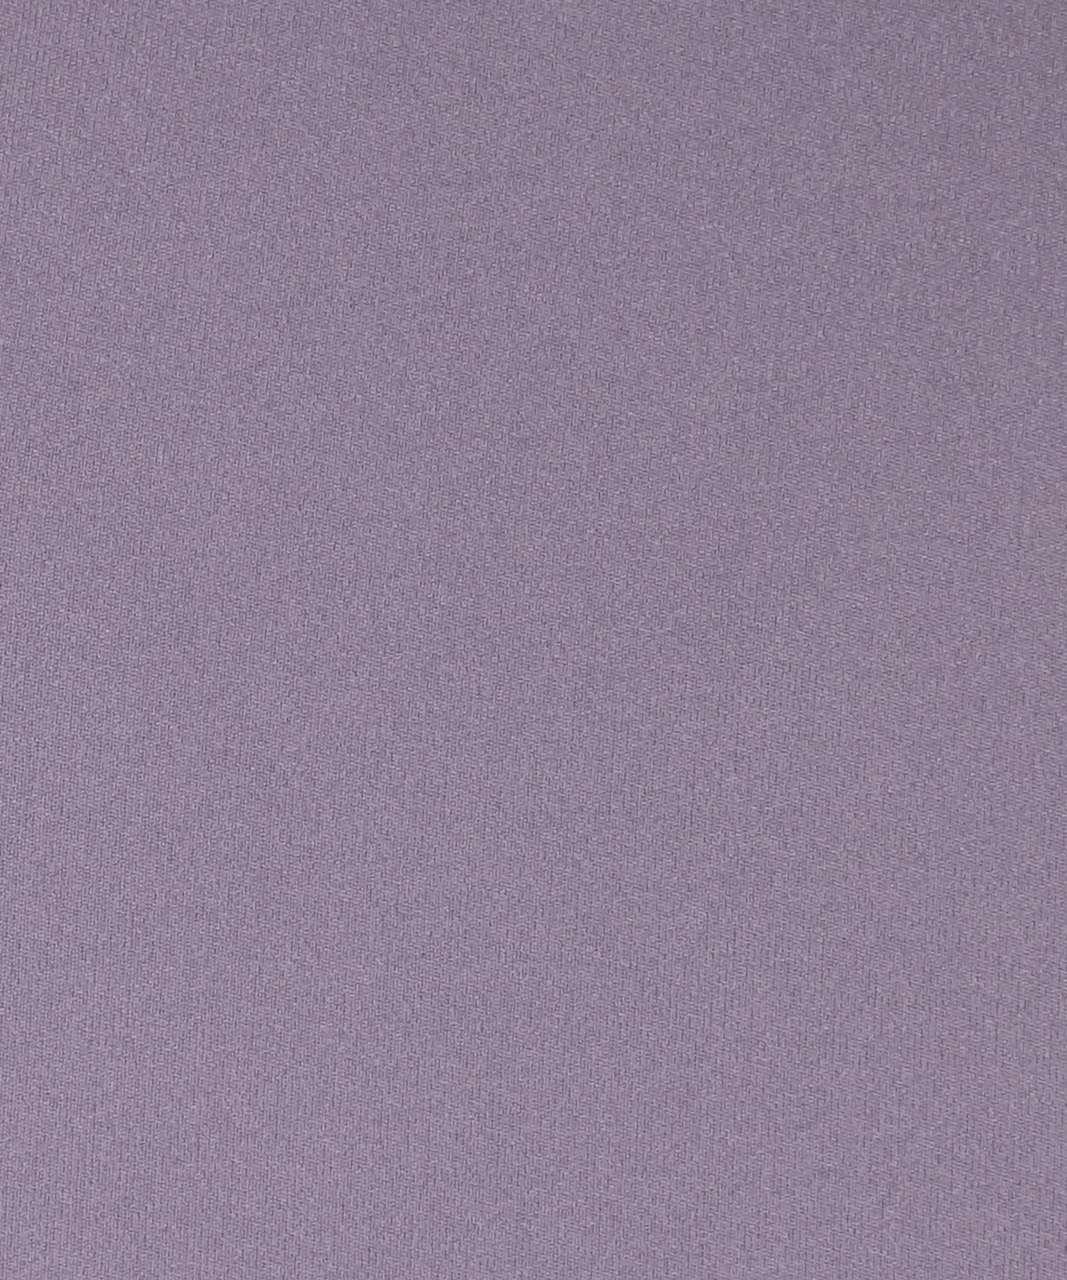 "Lululemon Pace Rival Crop *22"" - Graphite Purple"